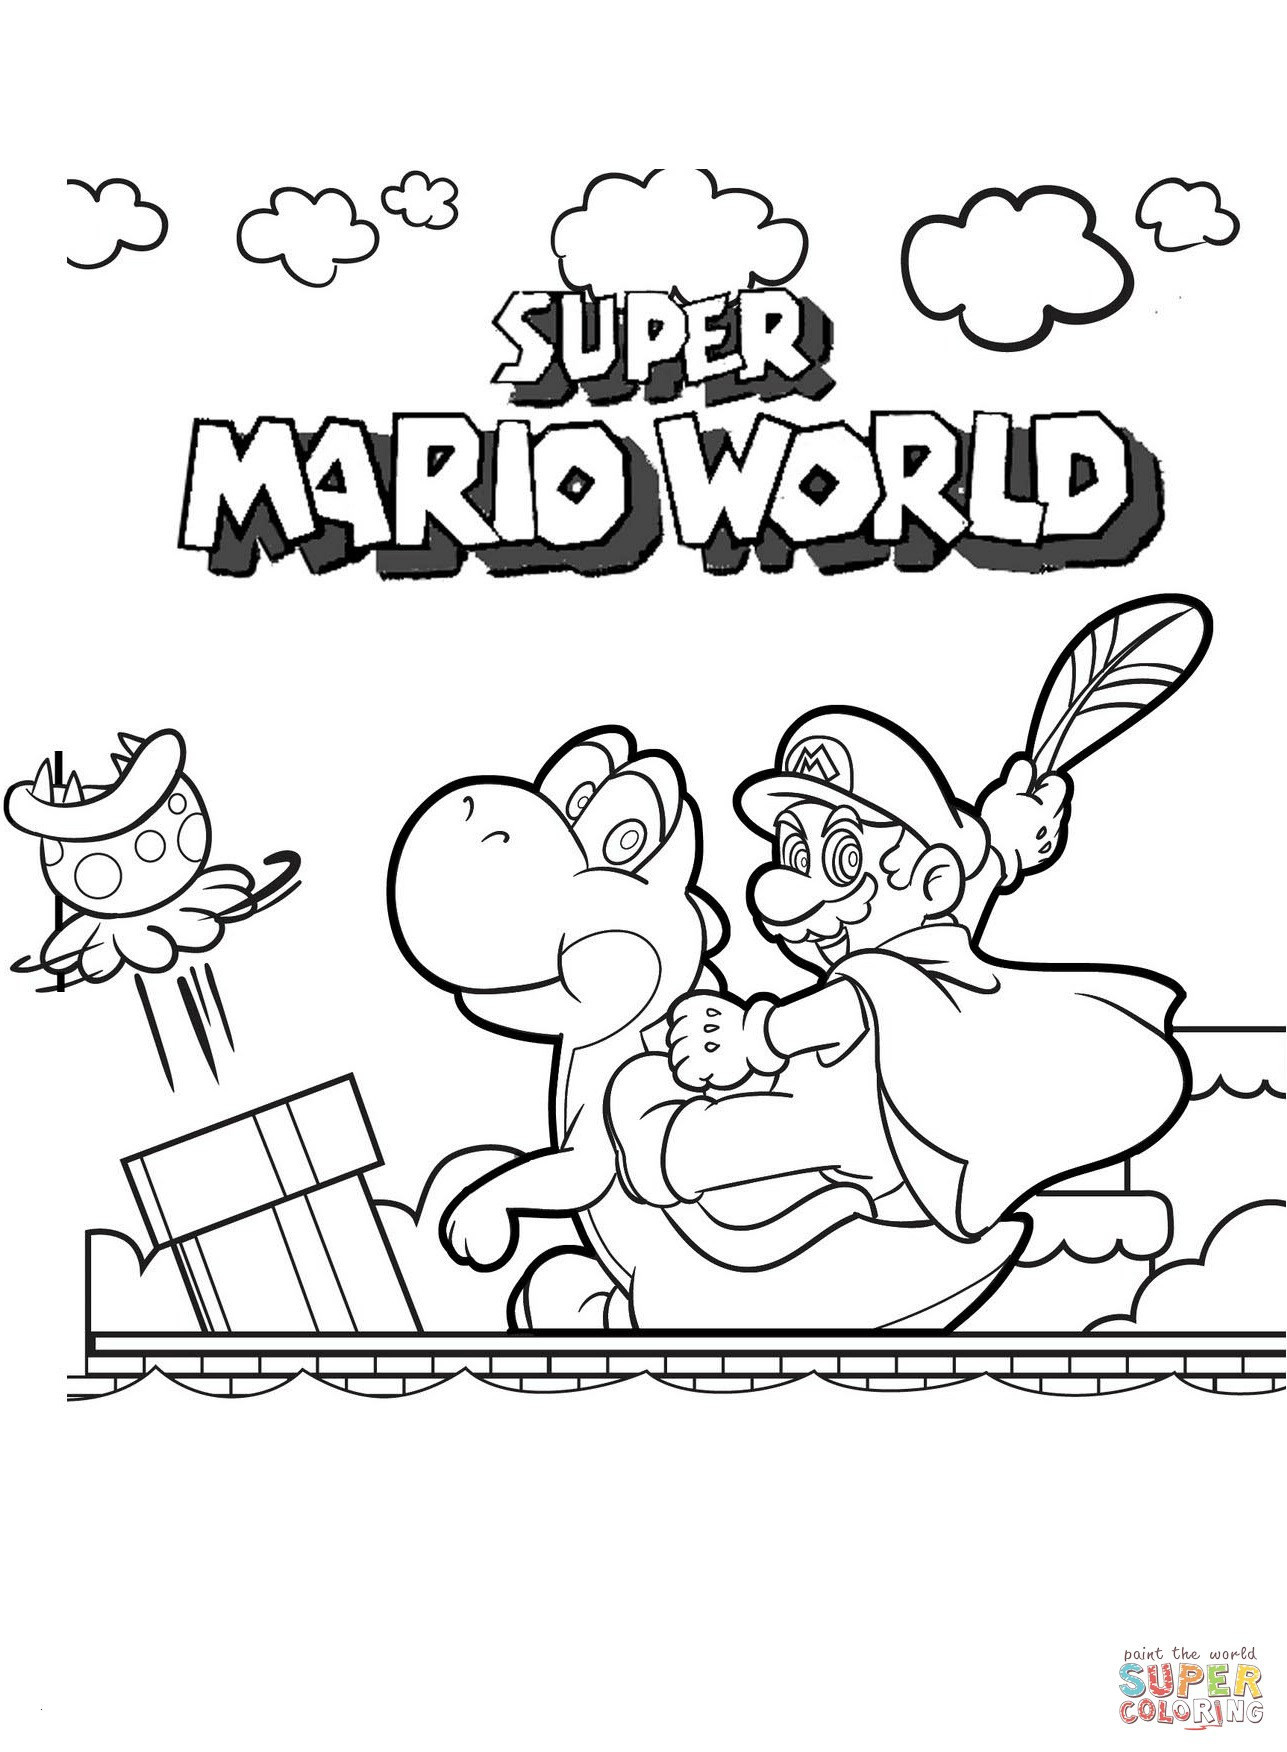 Super Mario Ausmalbilder Neu 37 Super Mario Kart Ausmalbilder Scoredatscore Inspirierend Super Bilder